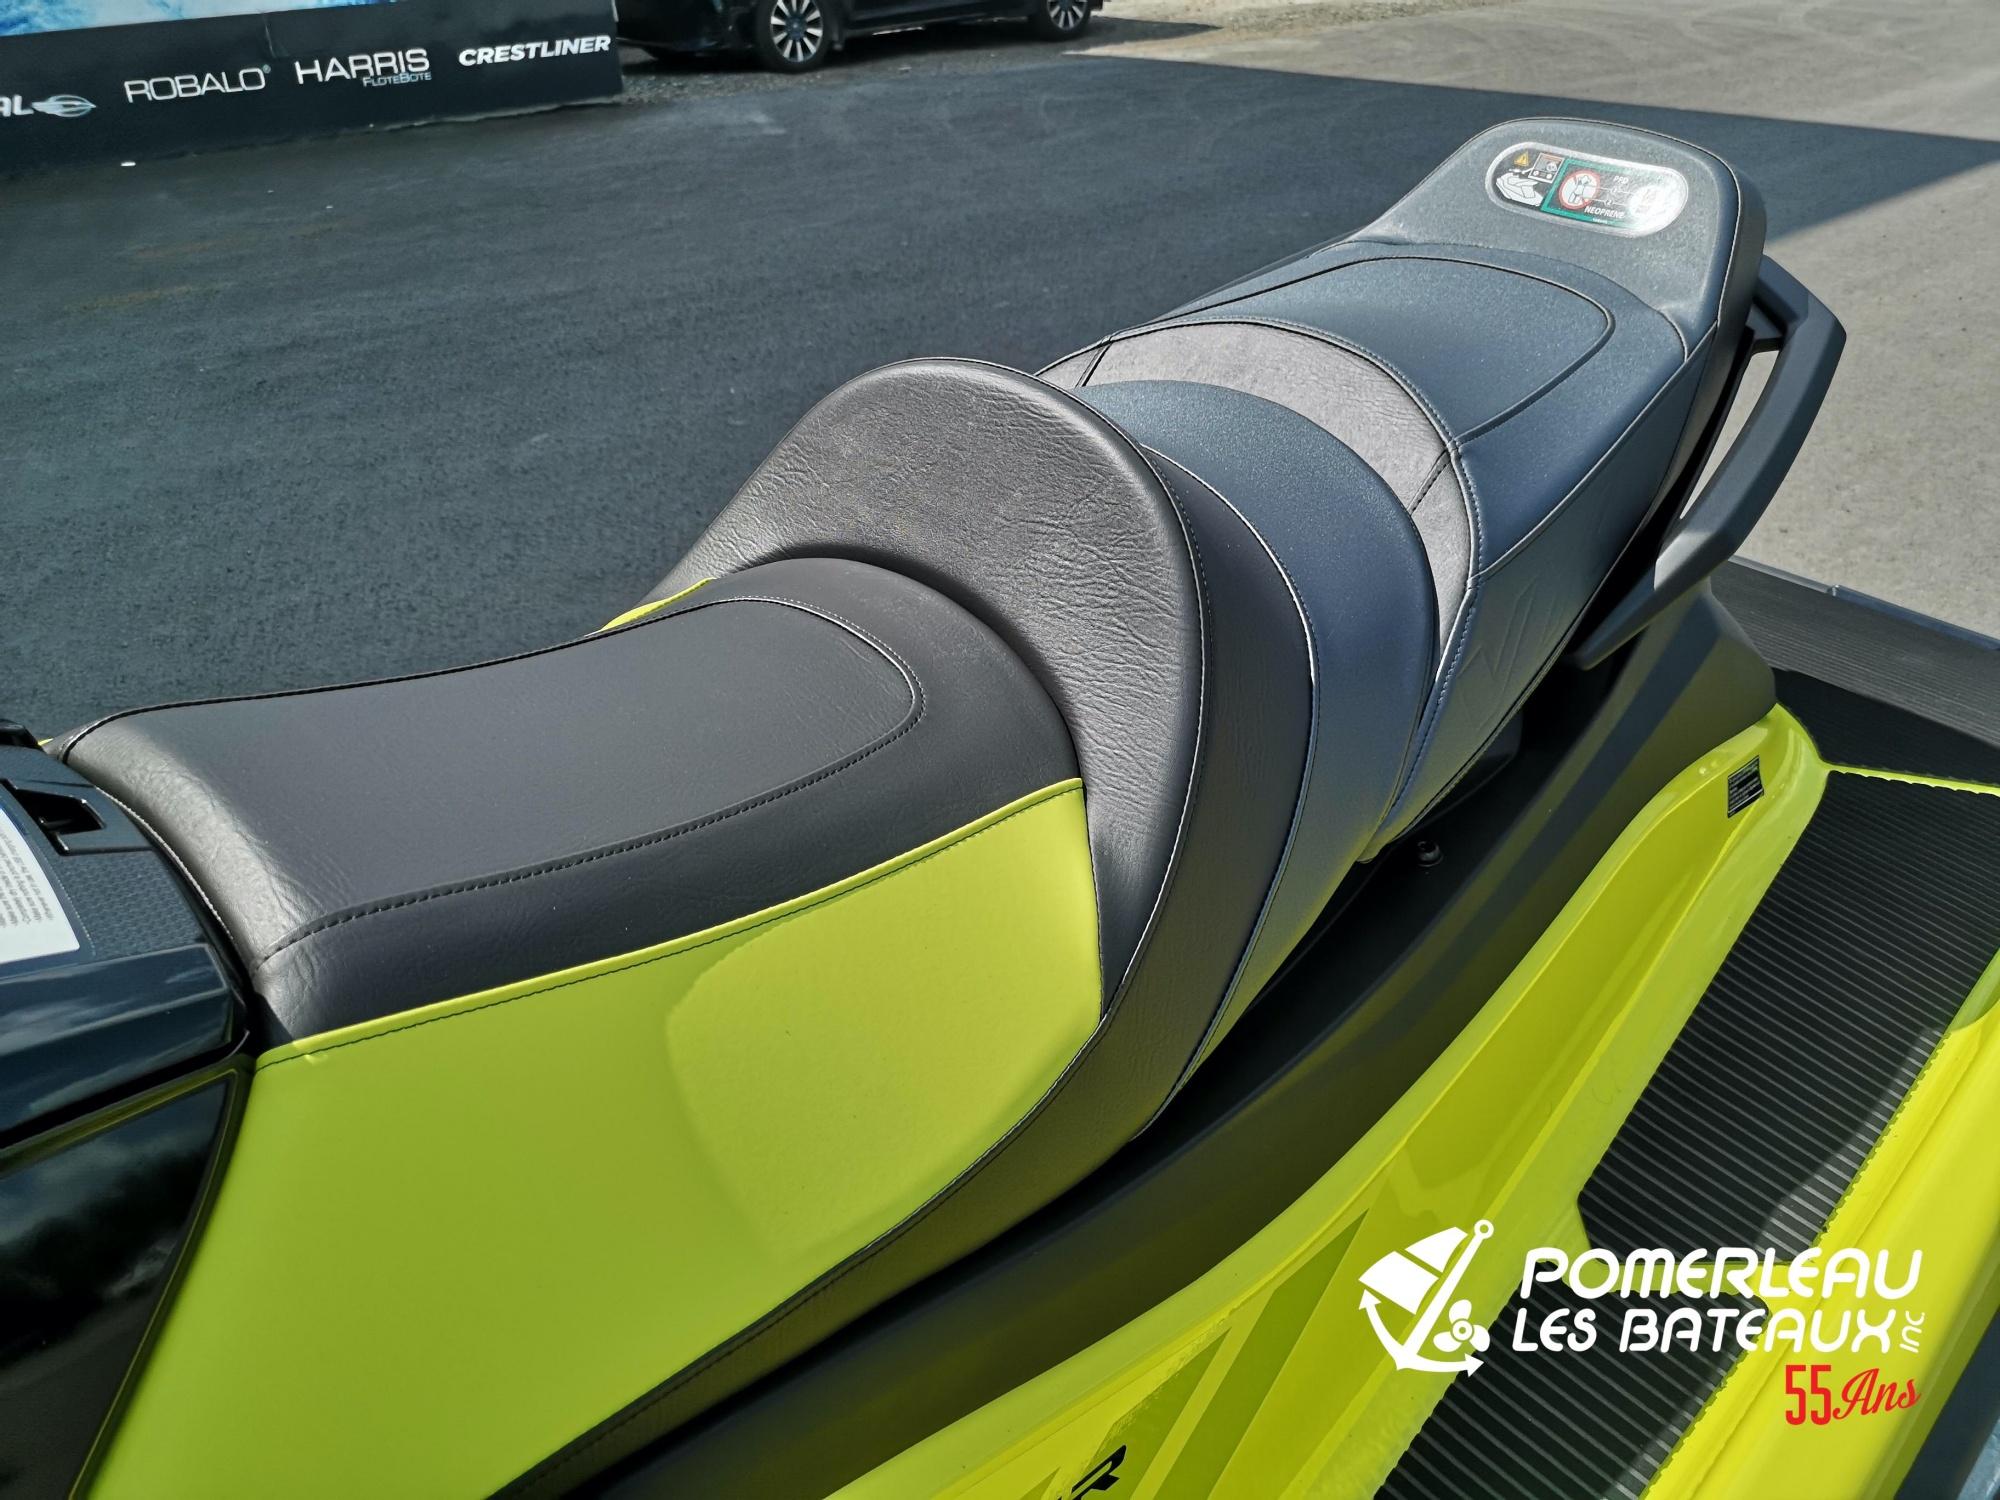 Yamaha vx cruiser ho - IMG_20210824_131514